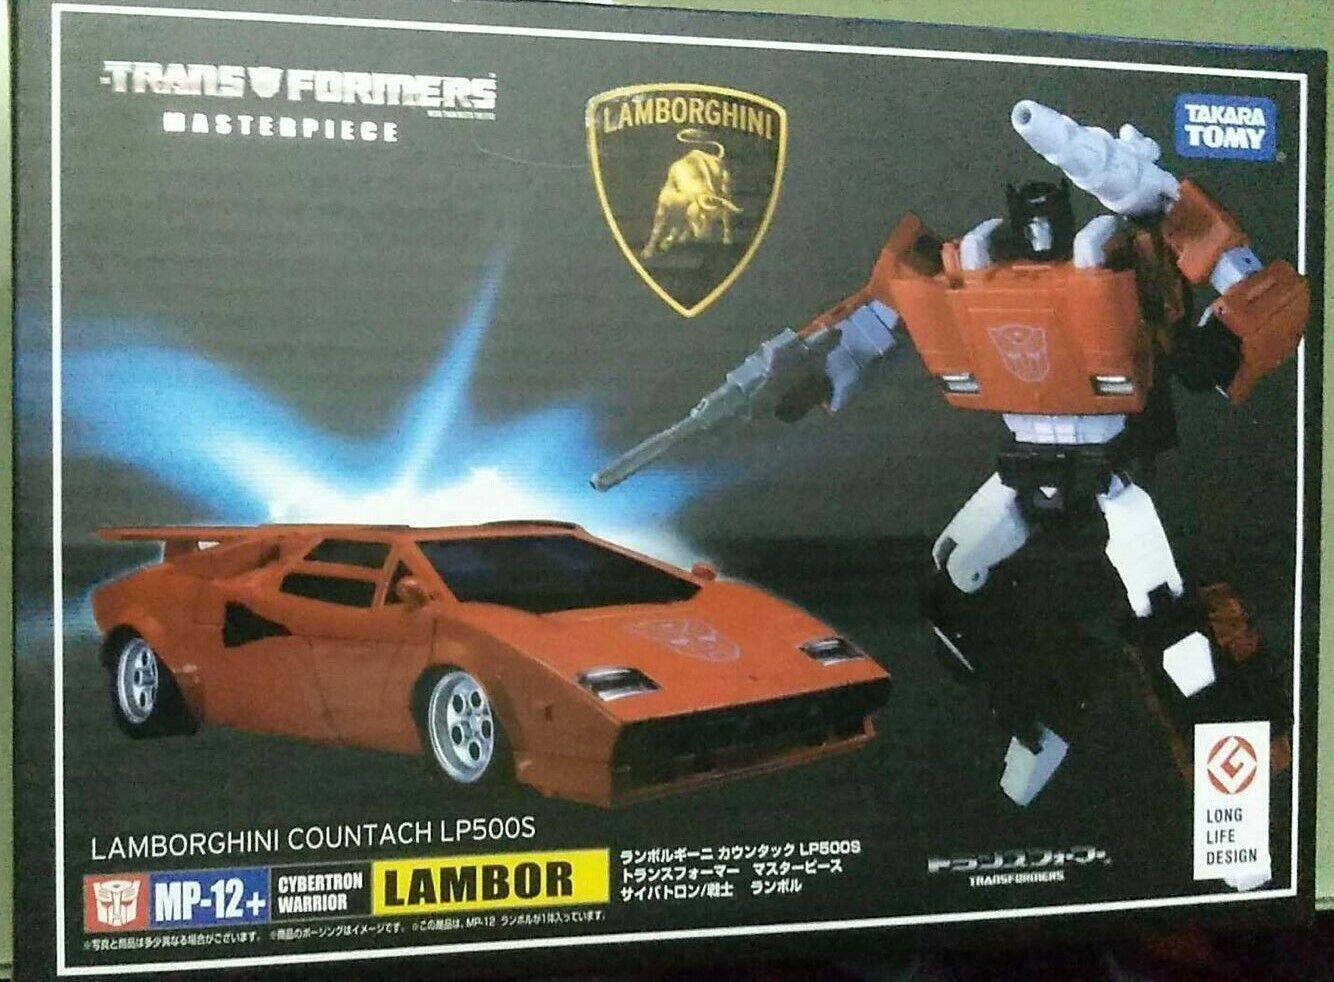 Takara Transformers Masterpiece MP-12 Sideswipe Lambor G1 Color Acti